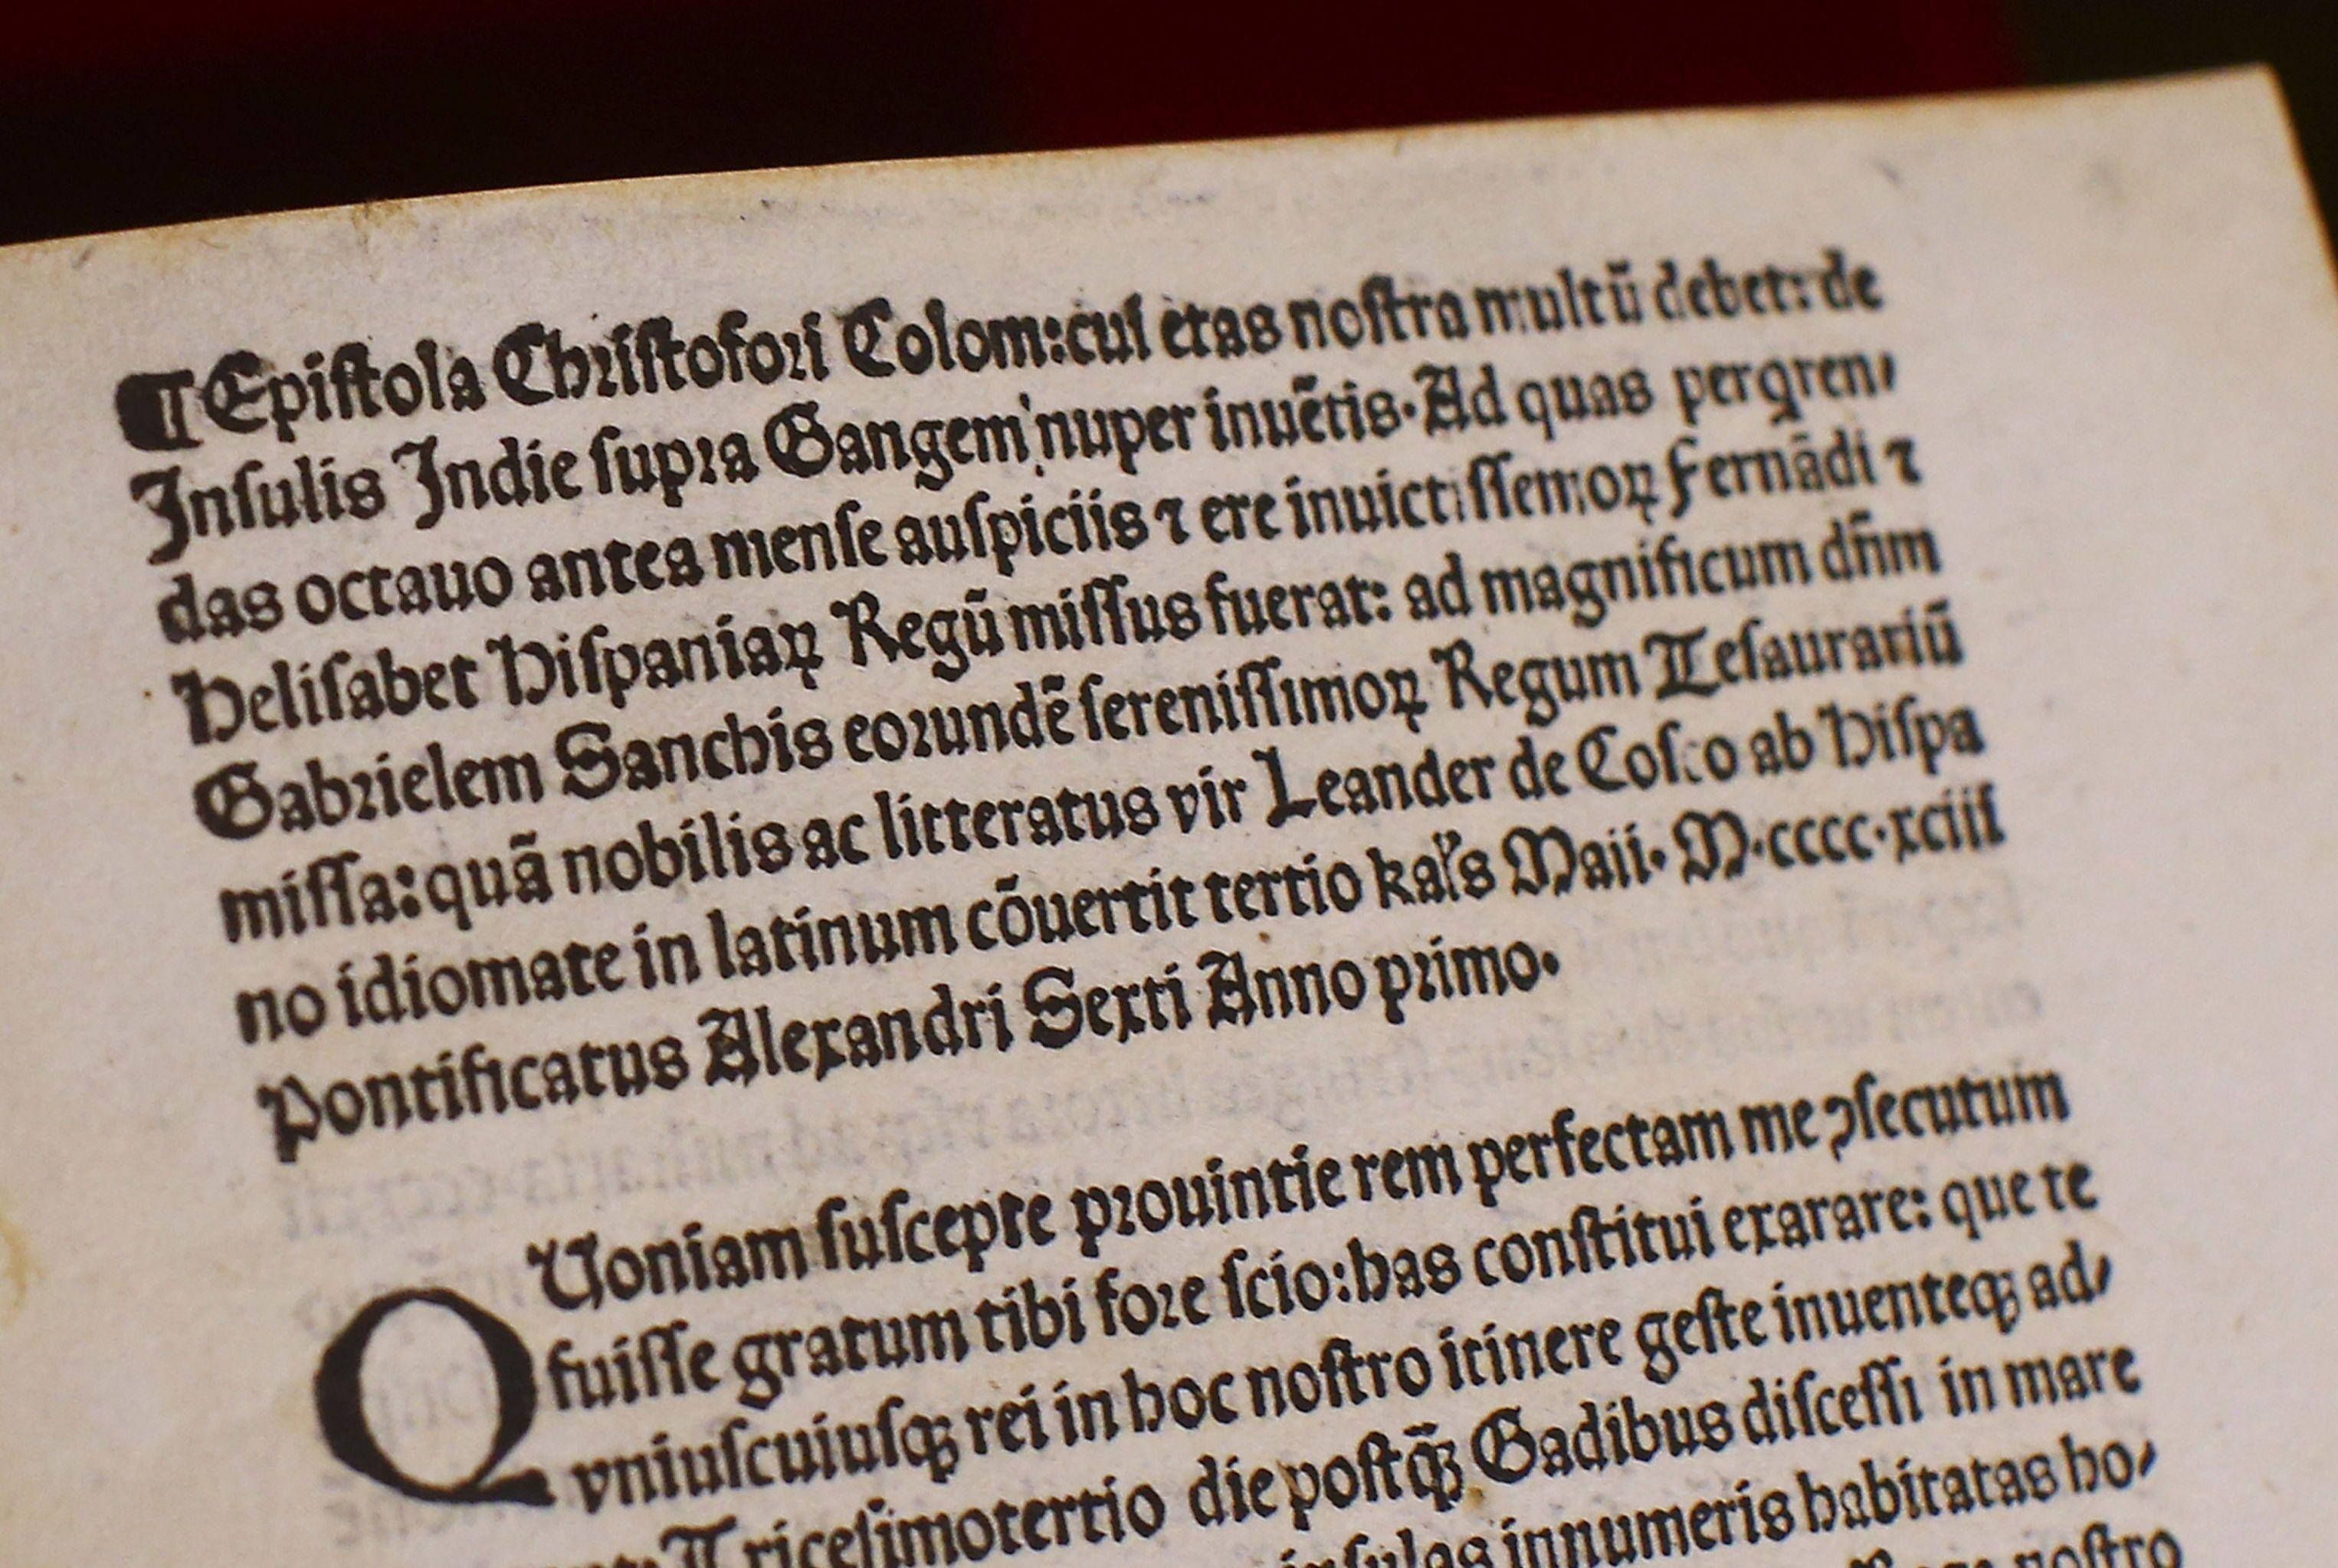 Cópia da carta de Cristóvão Colombo